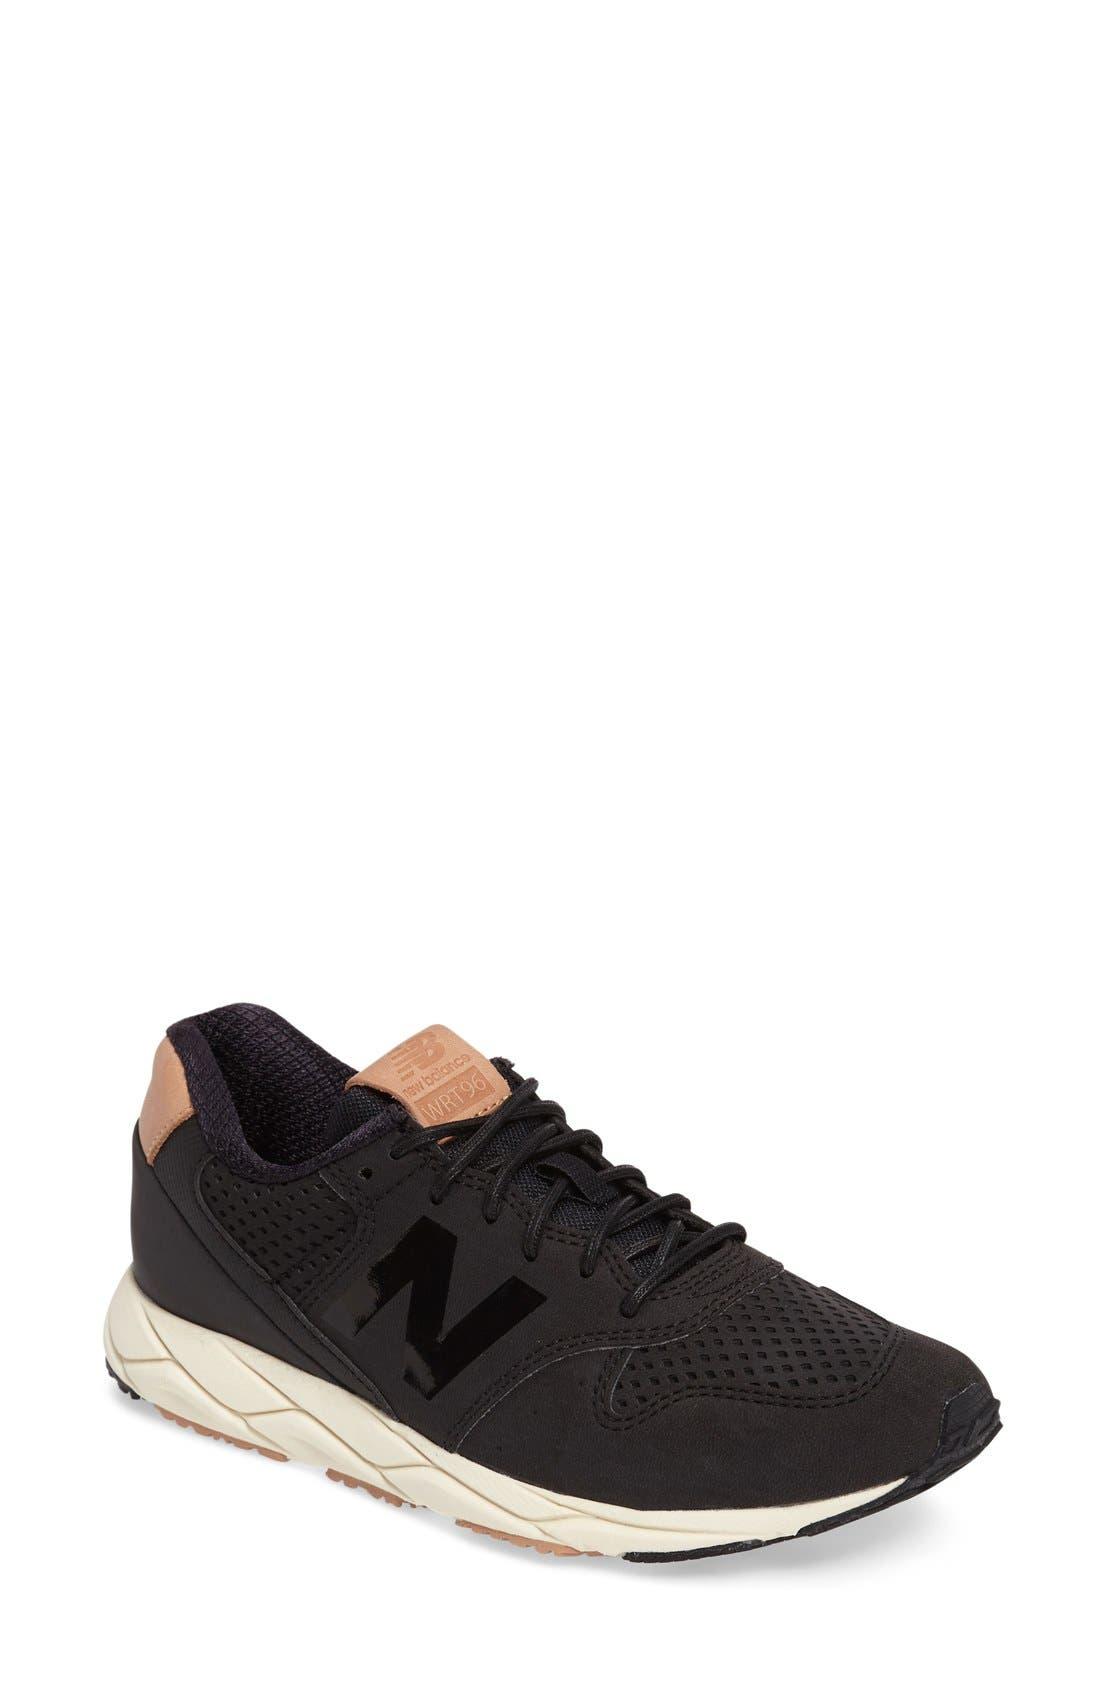 Main Image - New Balance 96 Mash-Up Sneaker (Women)